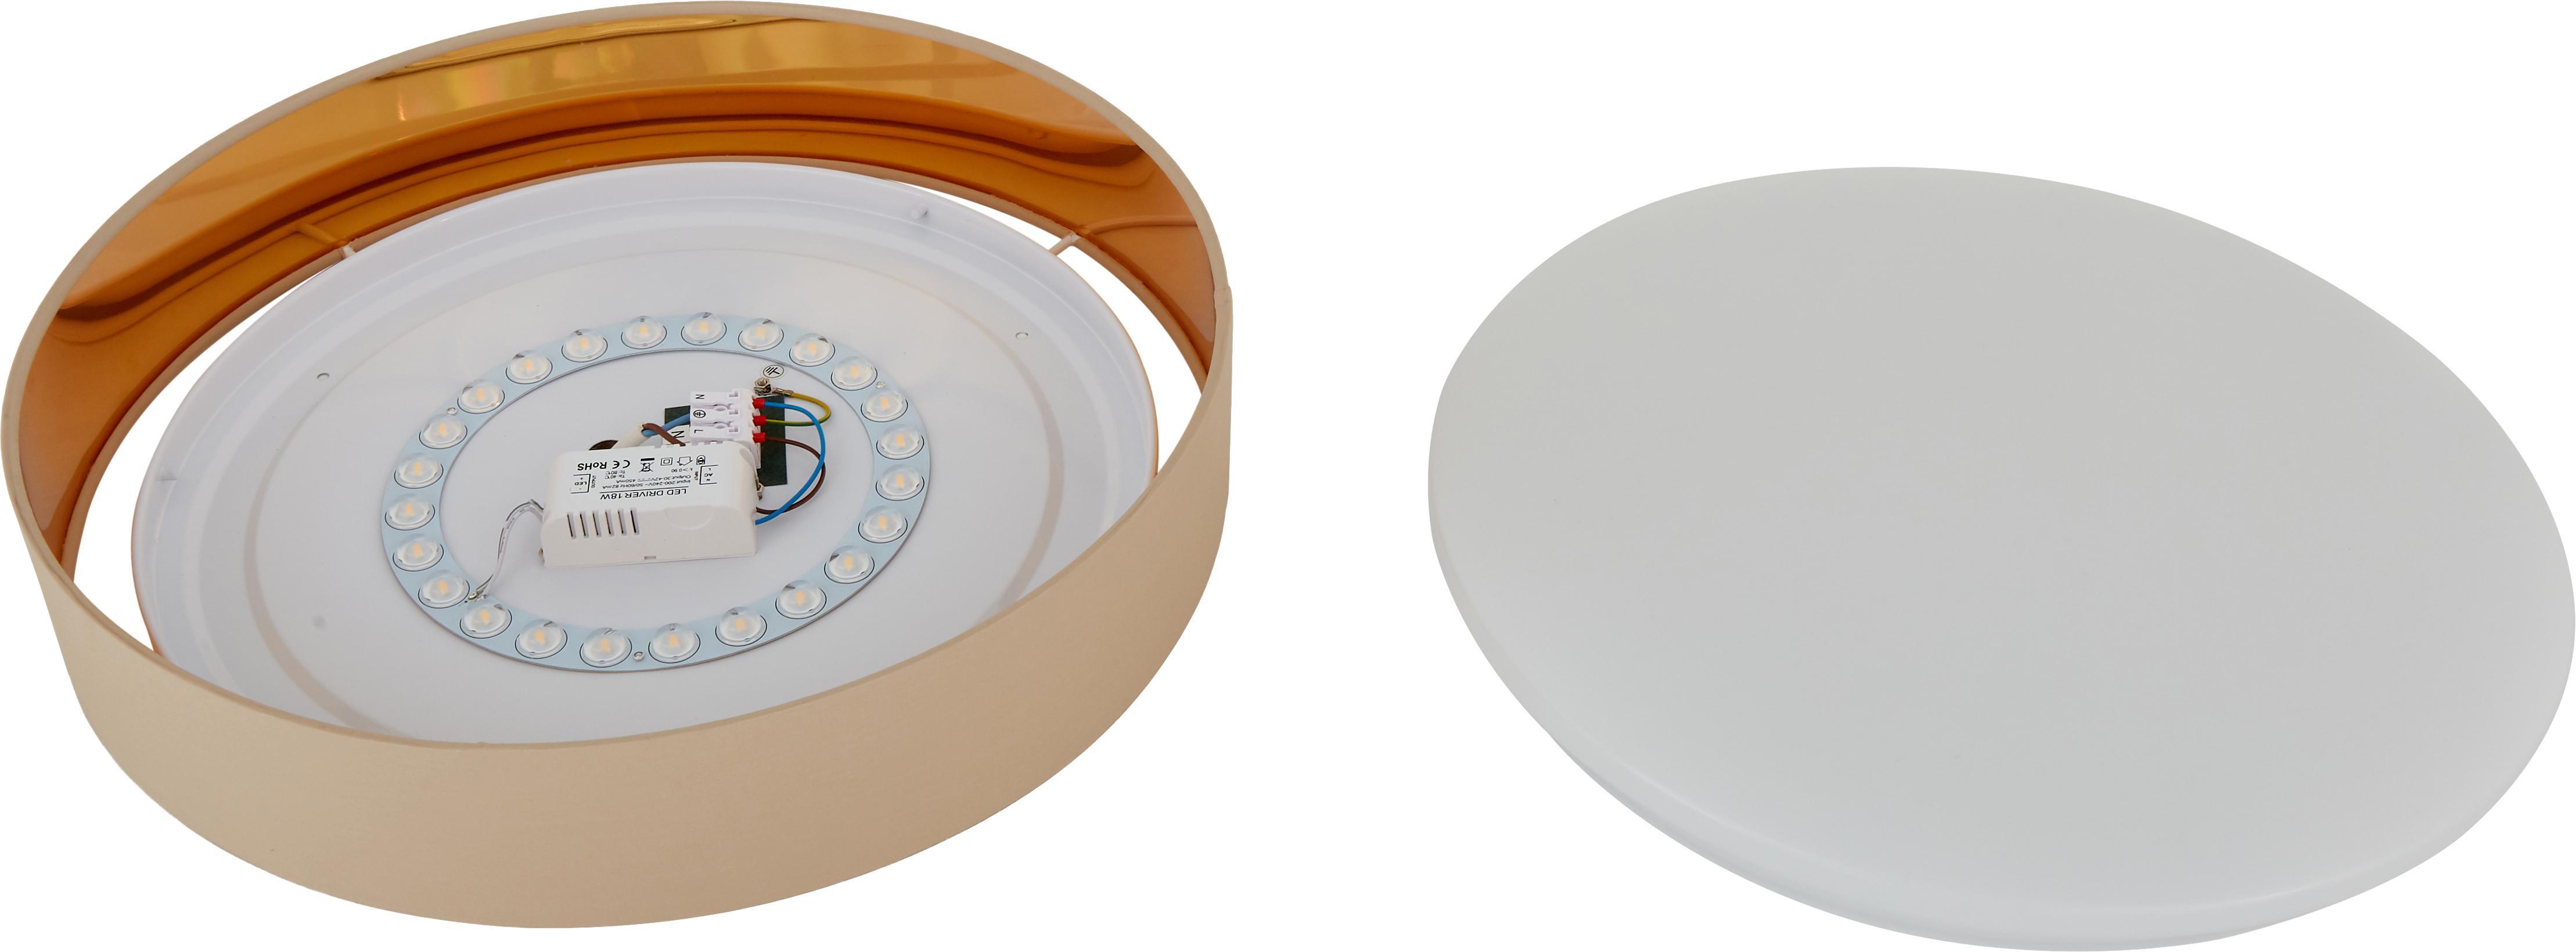 LED-Deckenleuchte Mallory, Rahmen: Metall, Diffusorscheibe: Kunststoff, Taupe, ∅ 41 x H 10 cm